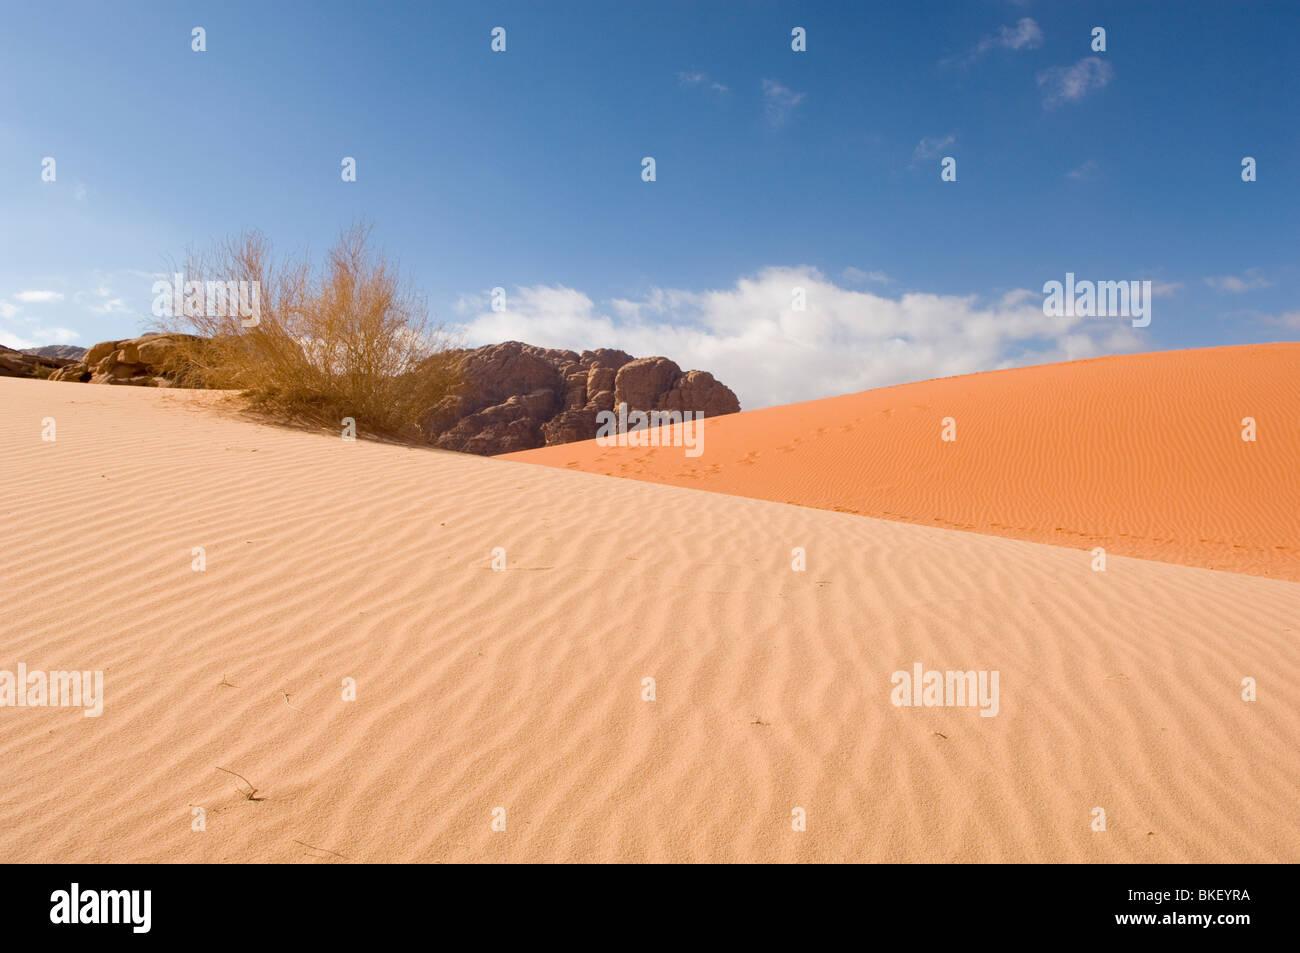 Sanddunes of red and yellow sand in the desert of Wadi Rum, Jordan - Stock Image